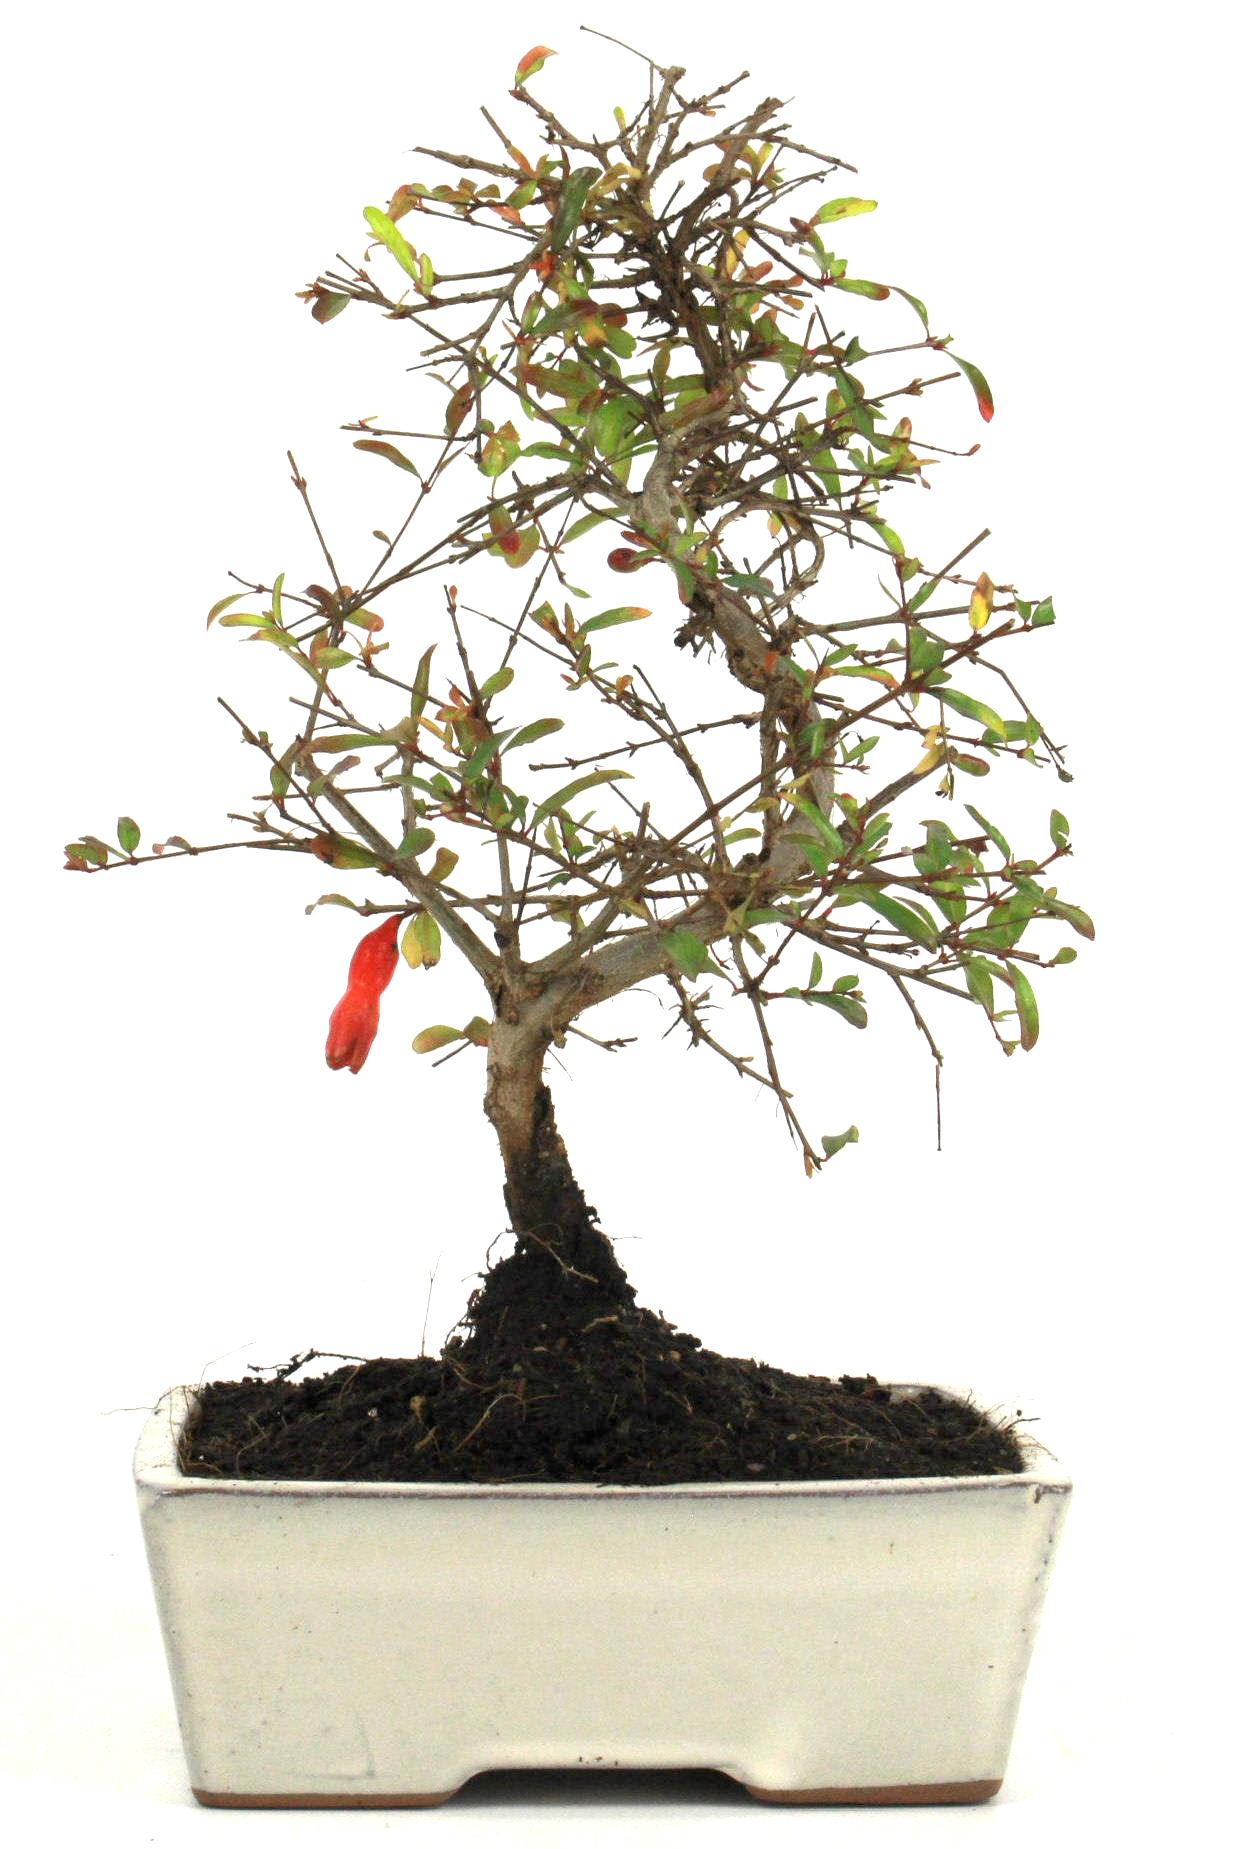 granatapfel bonsai 25 30 cm 1614 bei oyaki bonsai kaufen. Black Bedroom Furniture Sets. Home Design Ideas